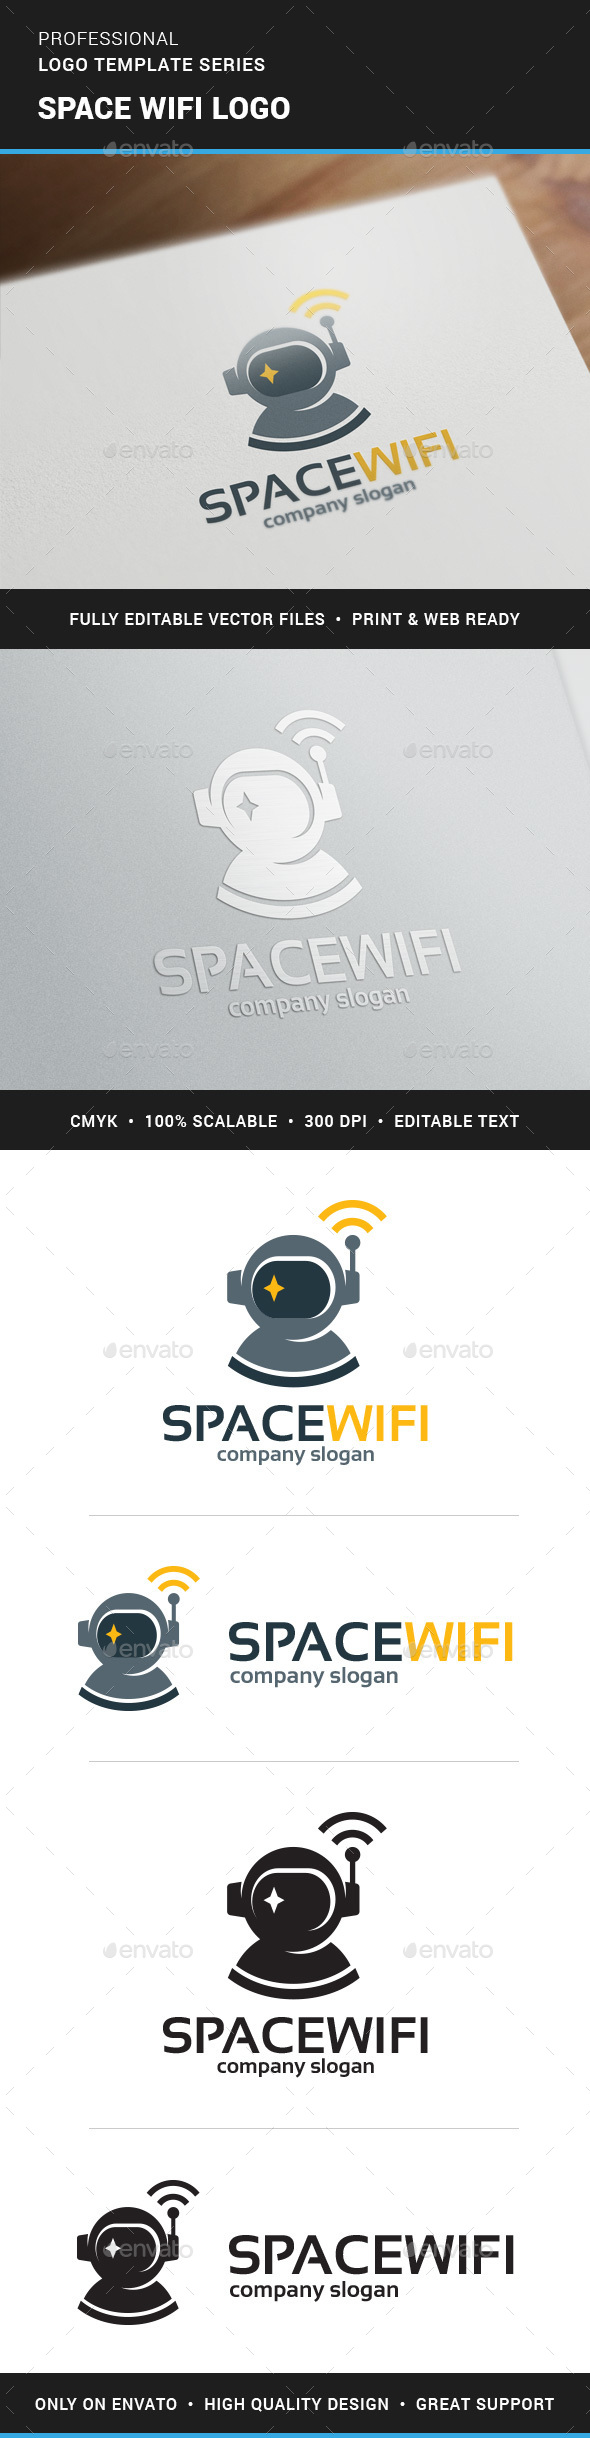 Space Wifi Logo Template - Logo Templates